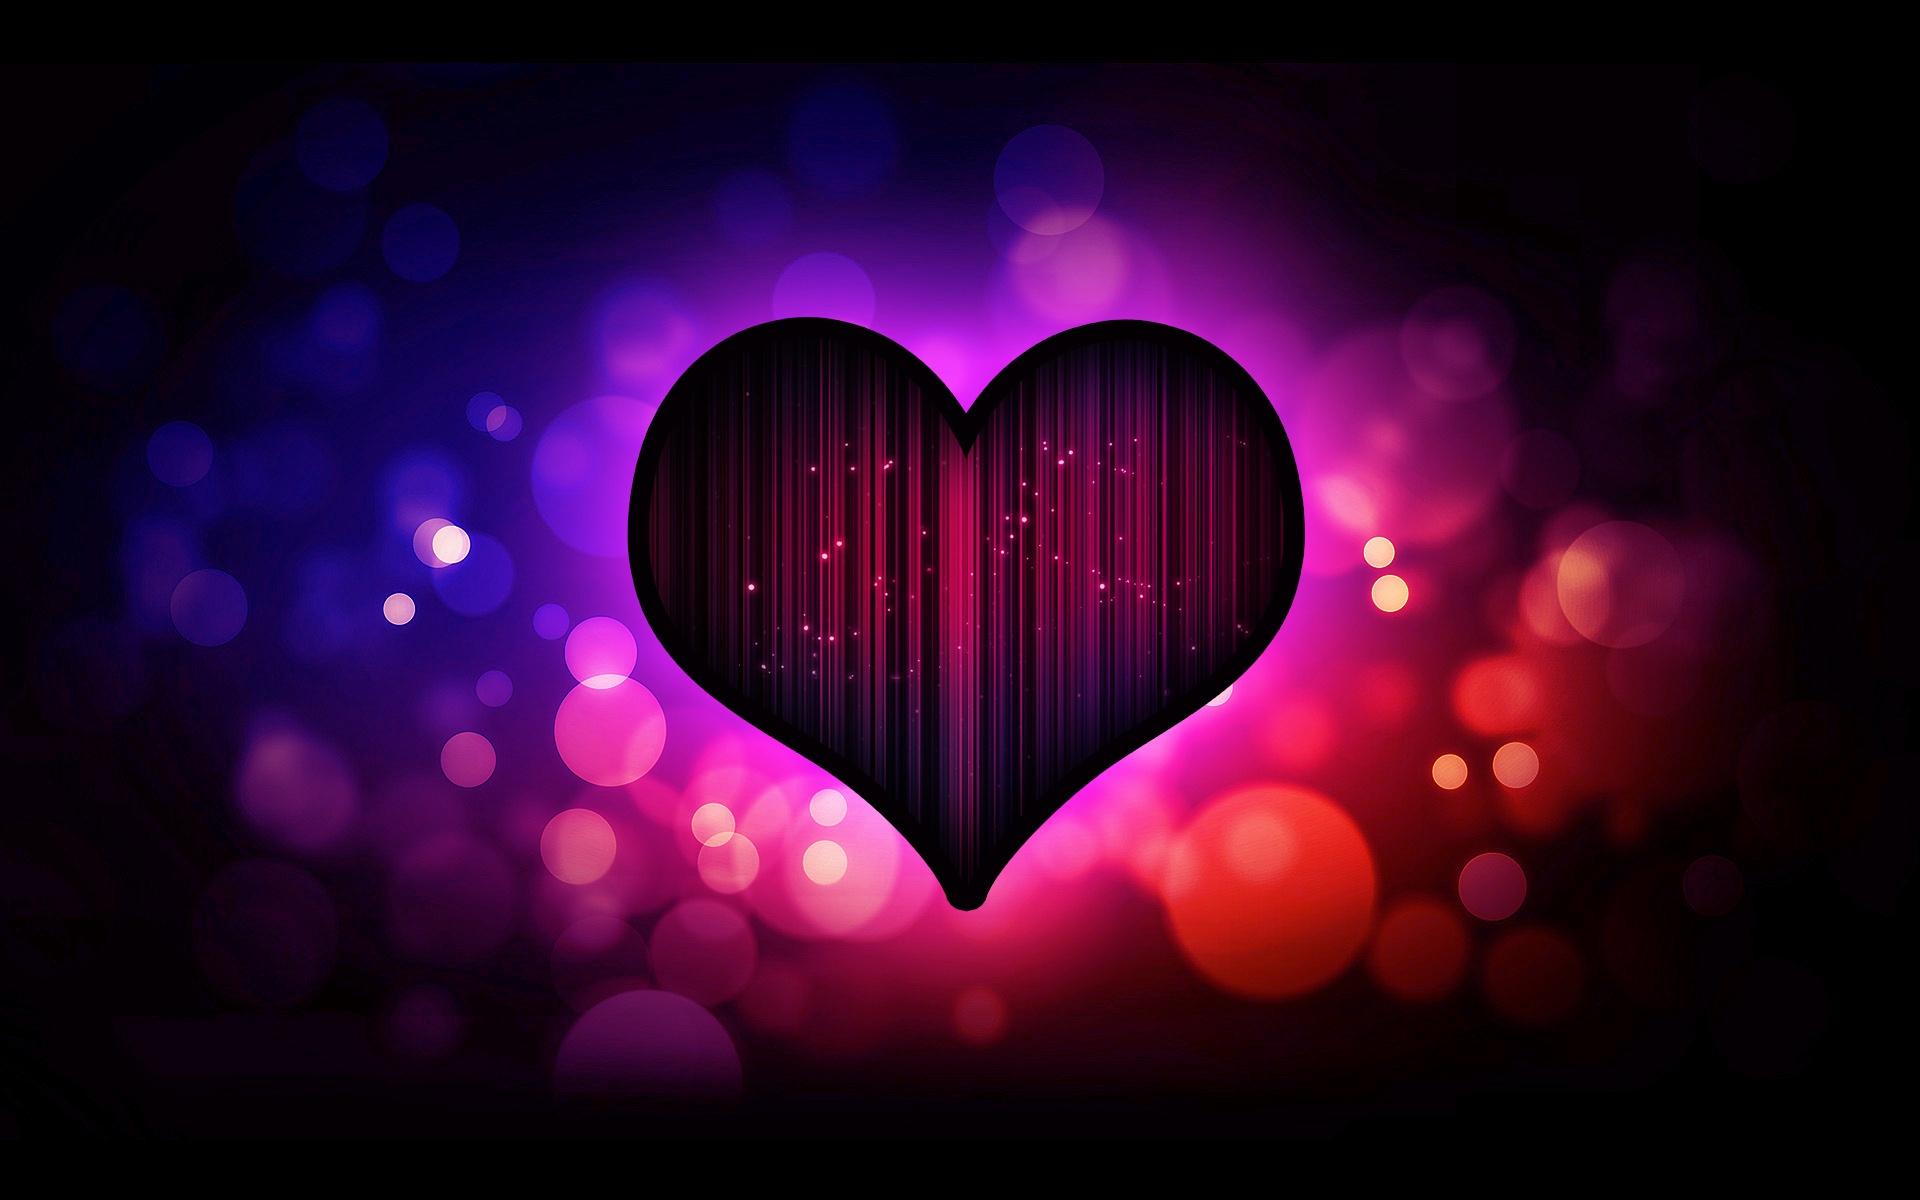 Download Wallpaper 1920x1200 Dark purple heart love HD ...